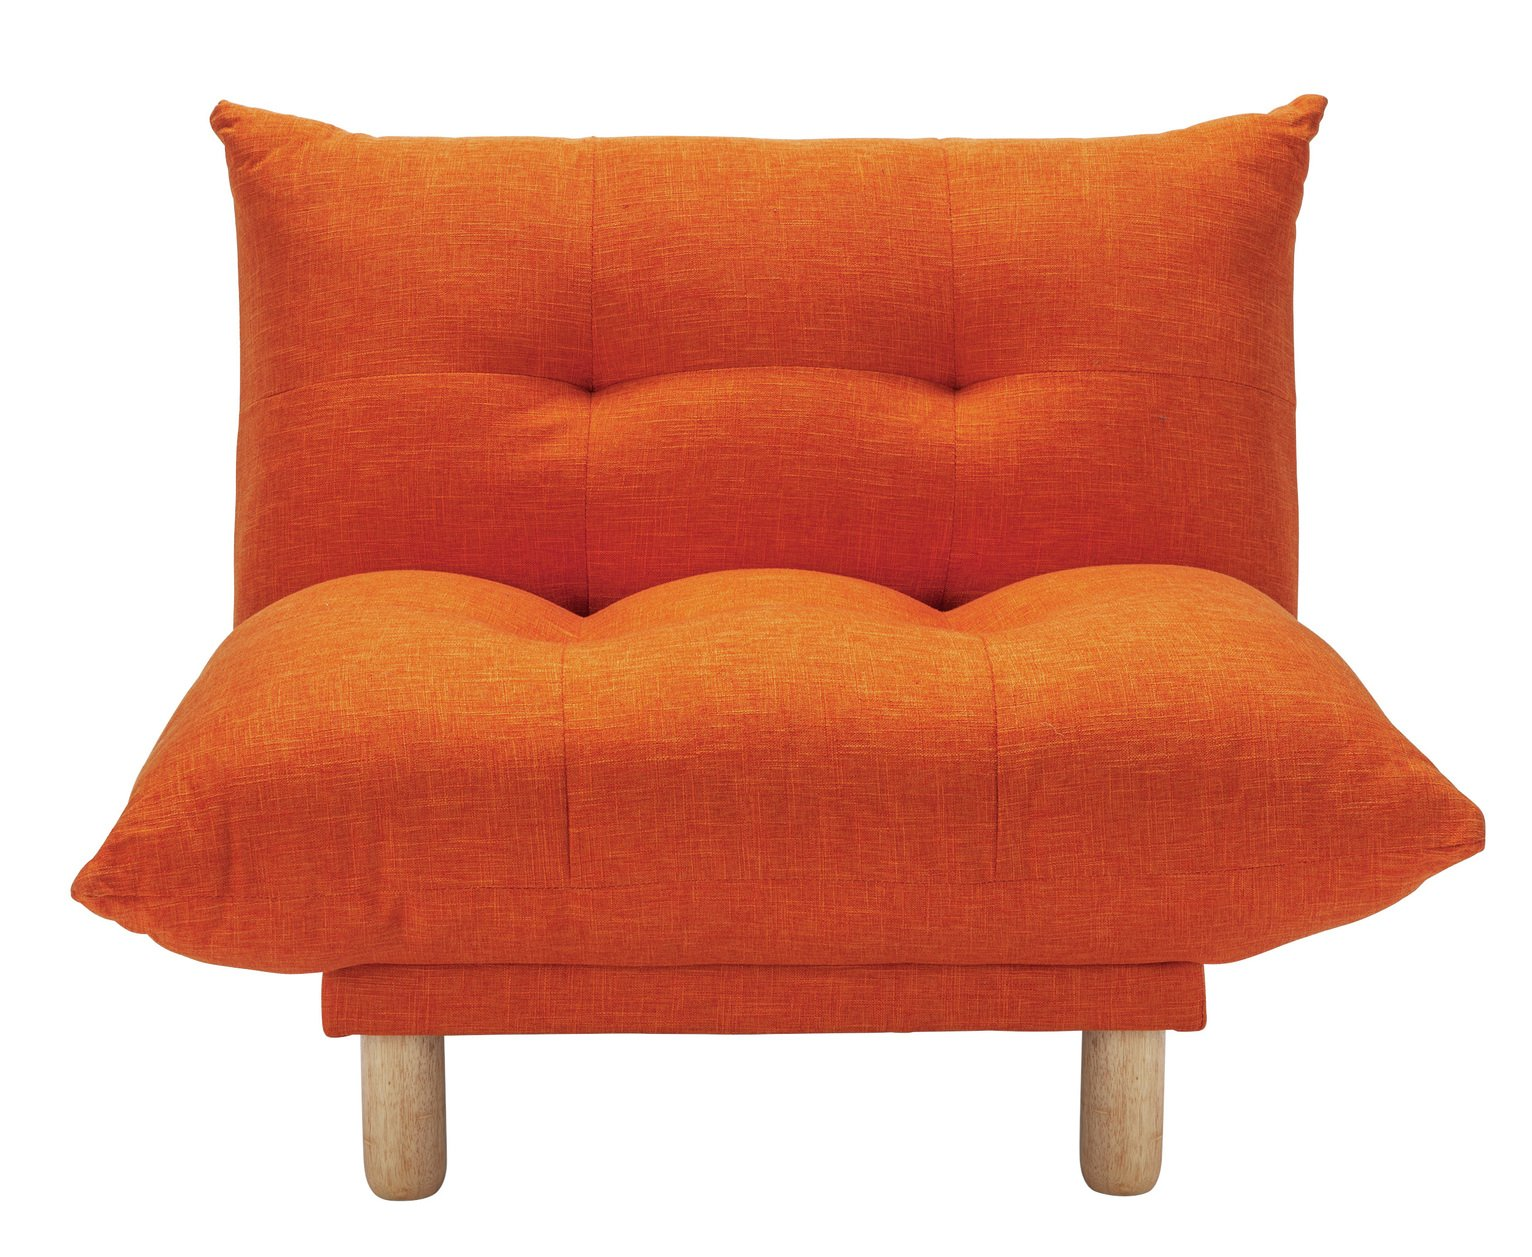 Habitat Kota Fabric Armchair - Orange